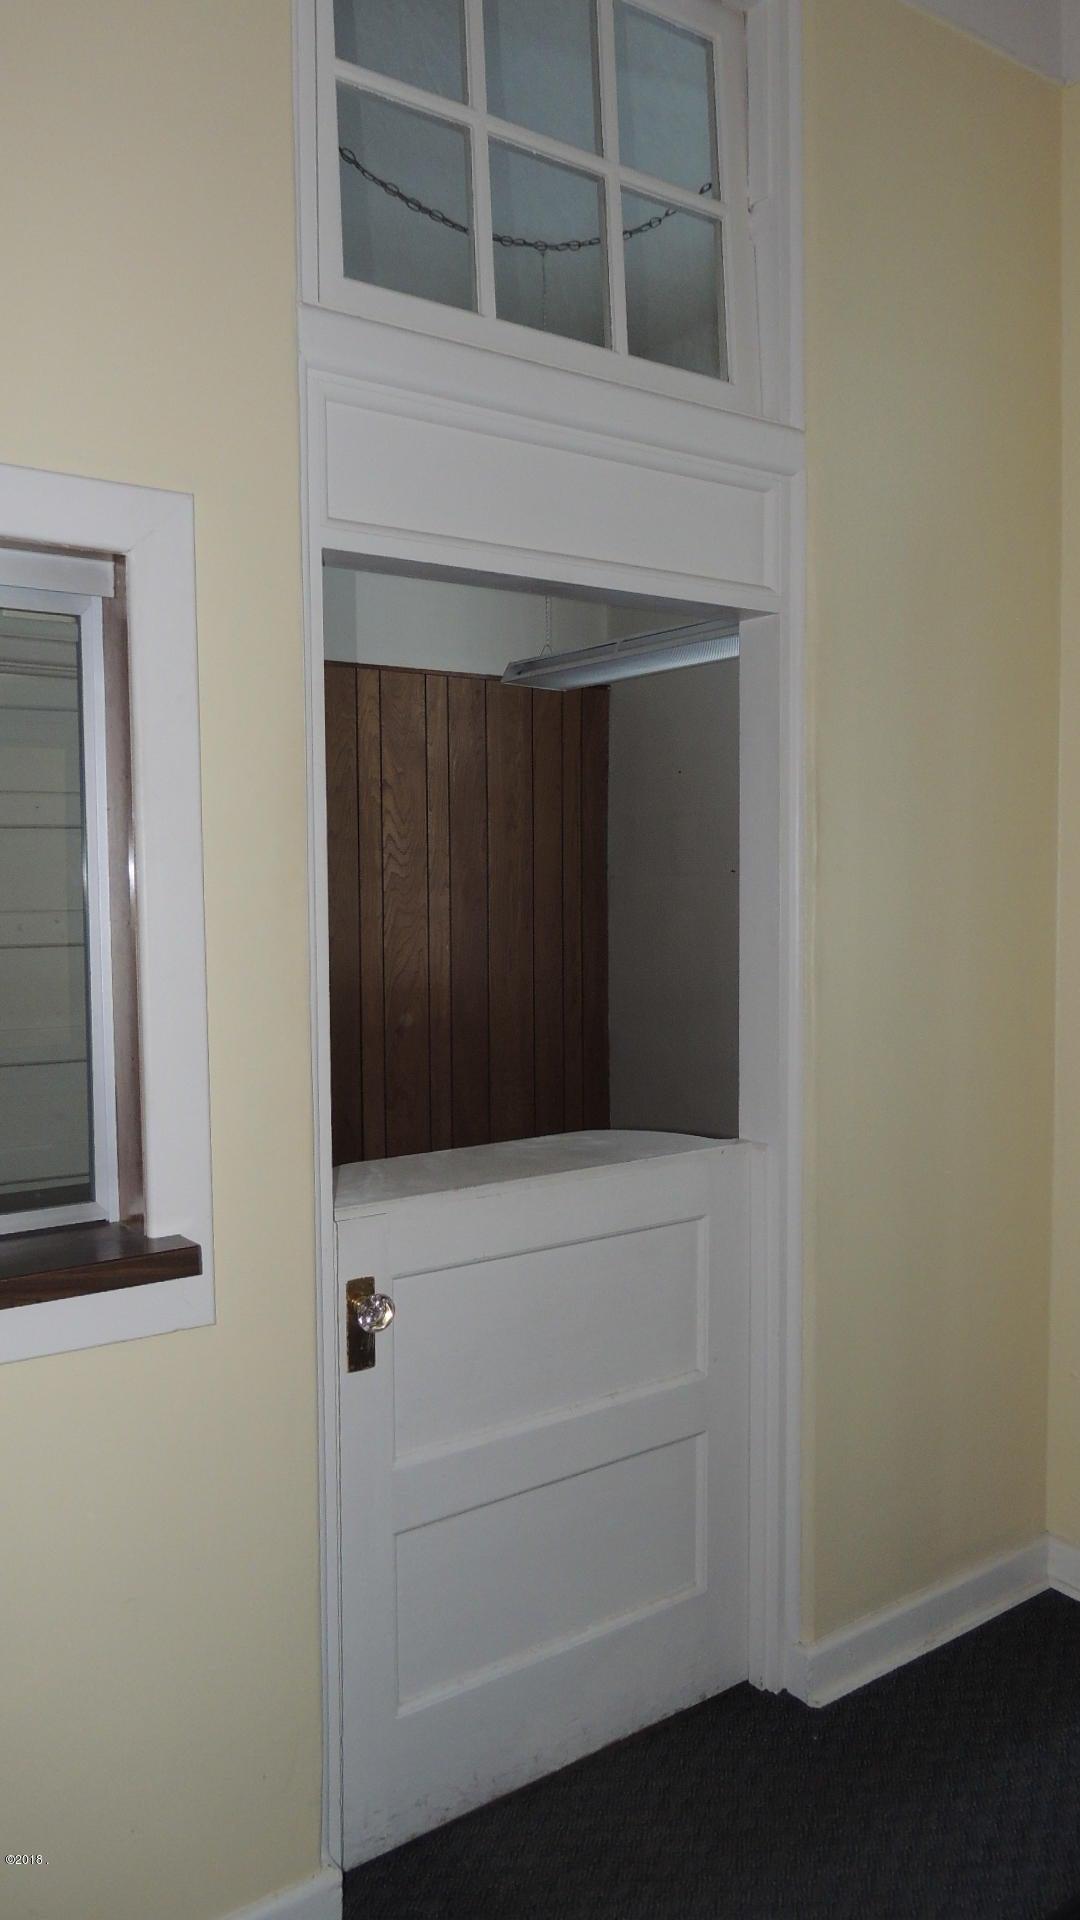 Additional photo for property listing at 3255 Lt. Moss Road 3255 Lt. Moss Road Missoula, Montana 59804 United States